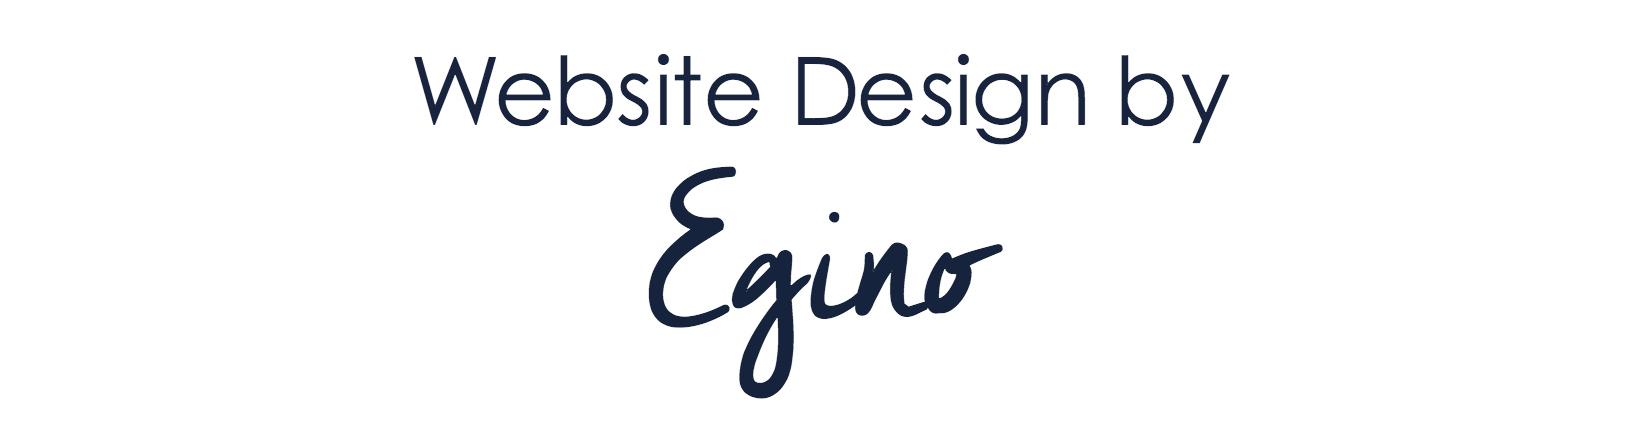 Website Design by Egino.jpg